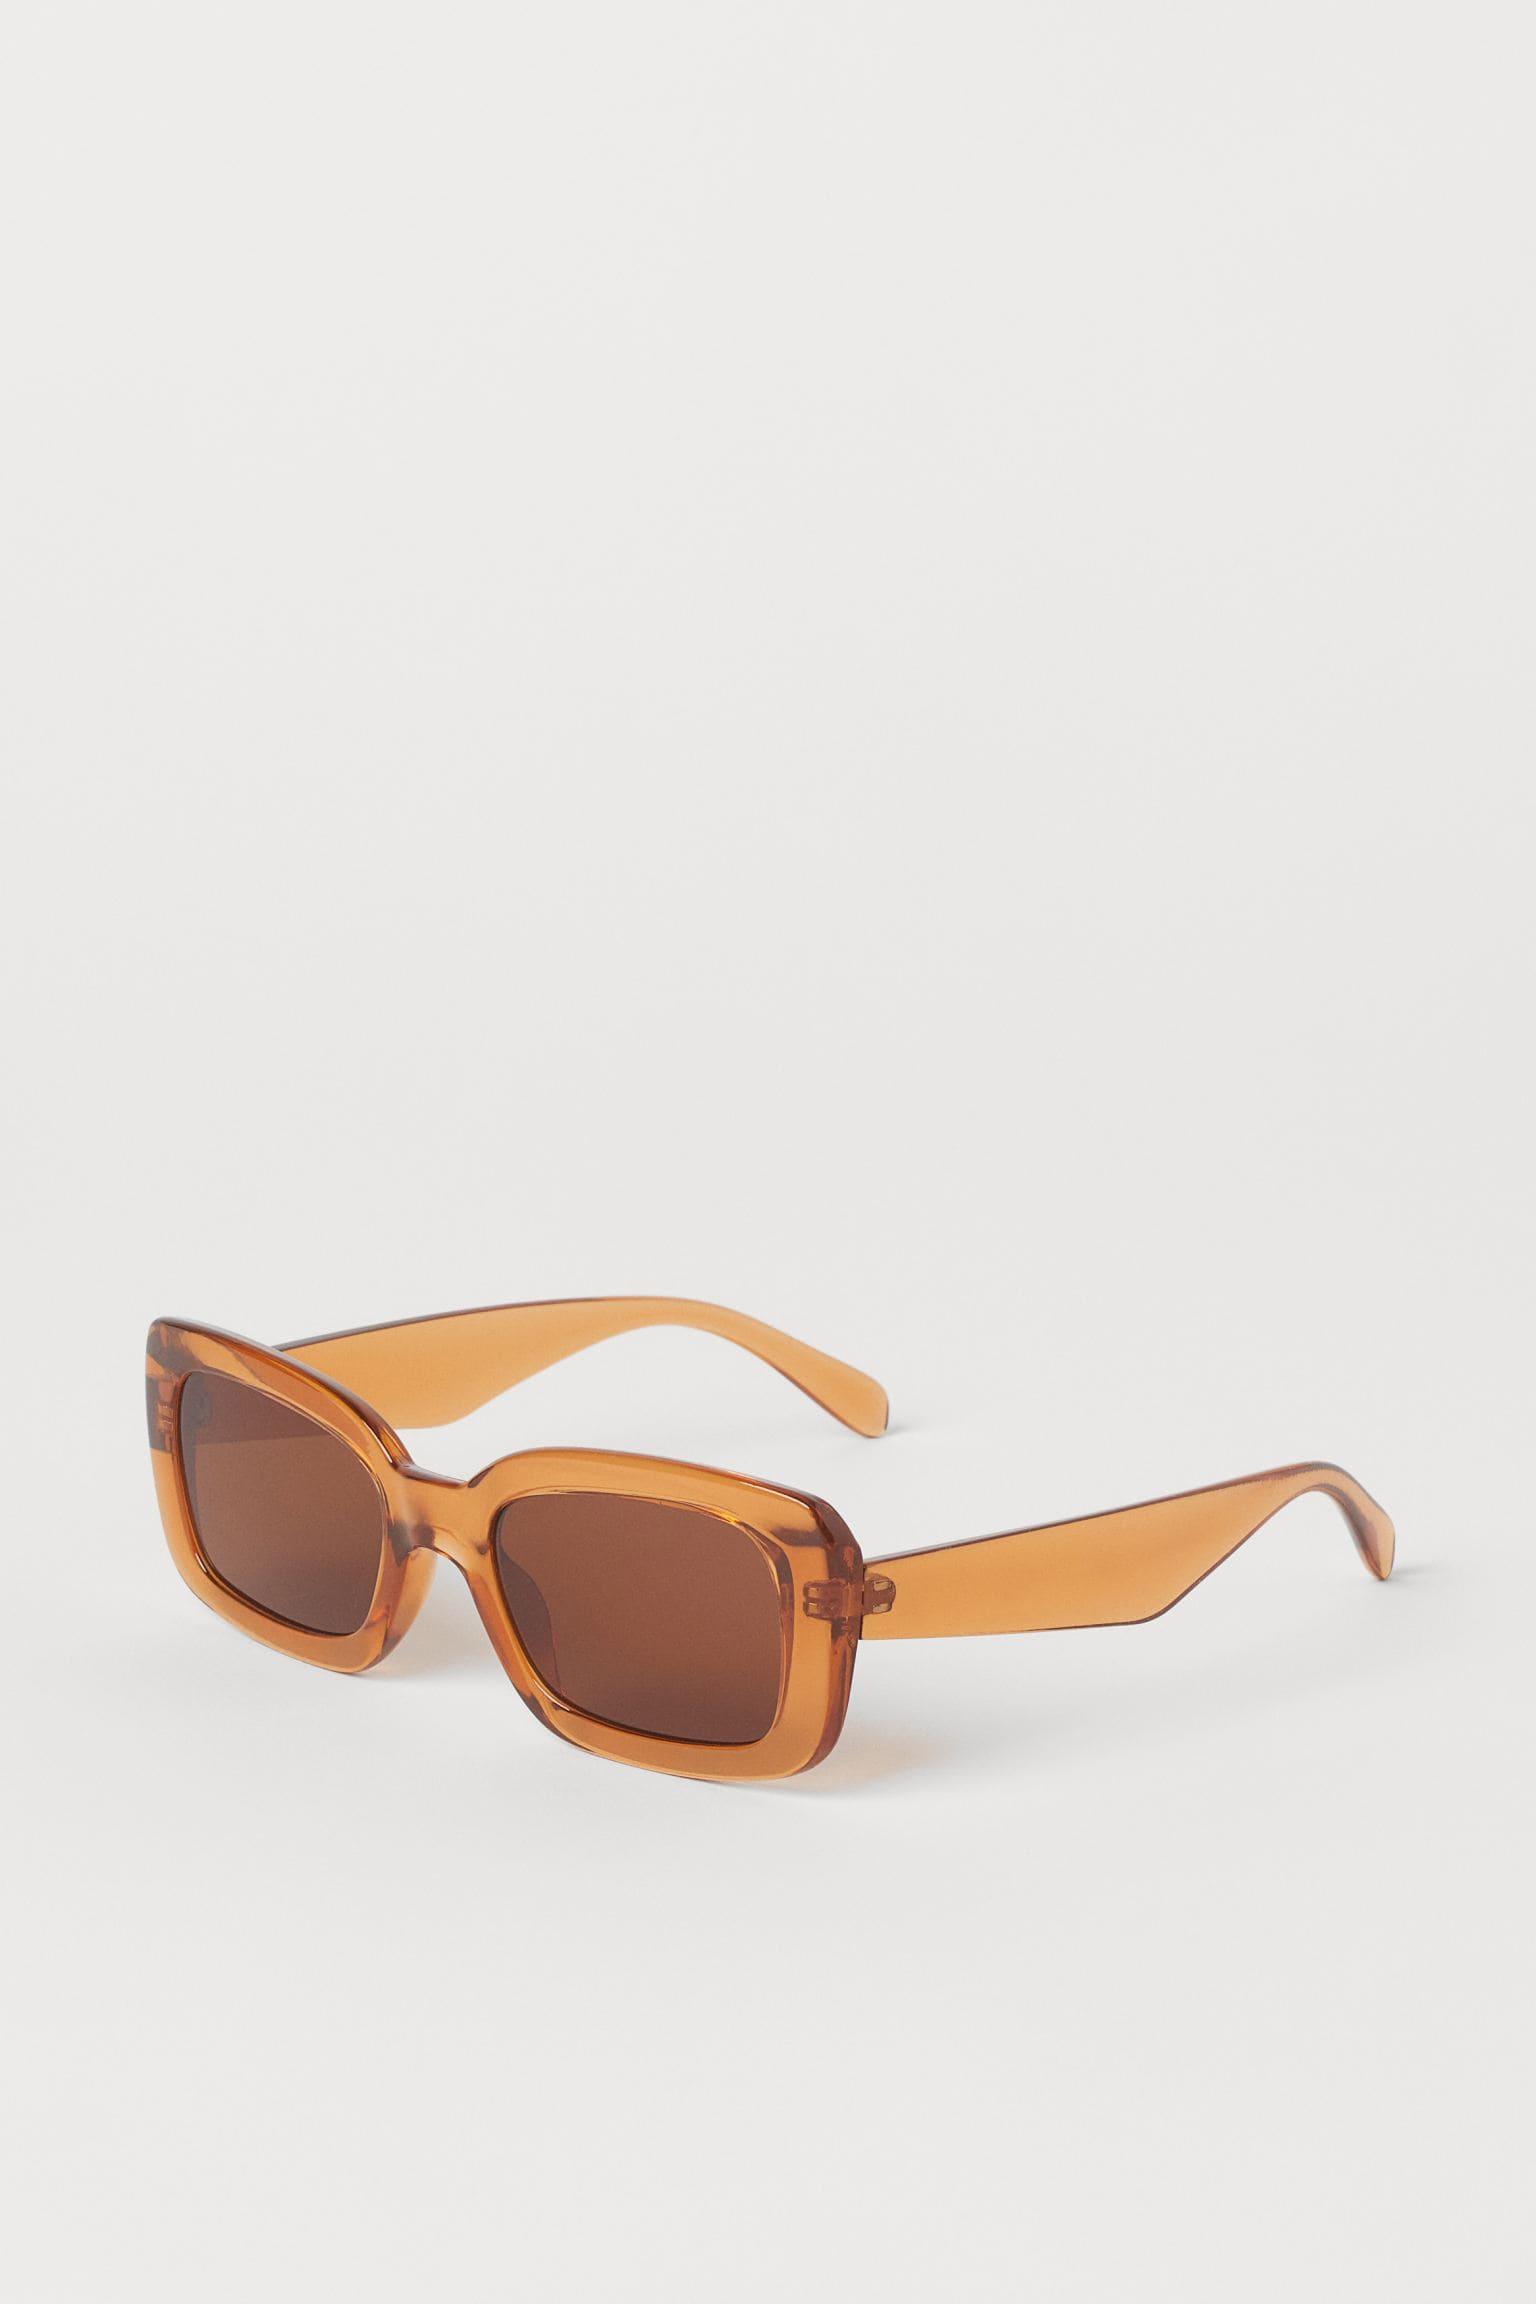 Trendiga solglasögon i orange 2021